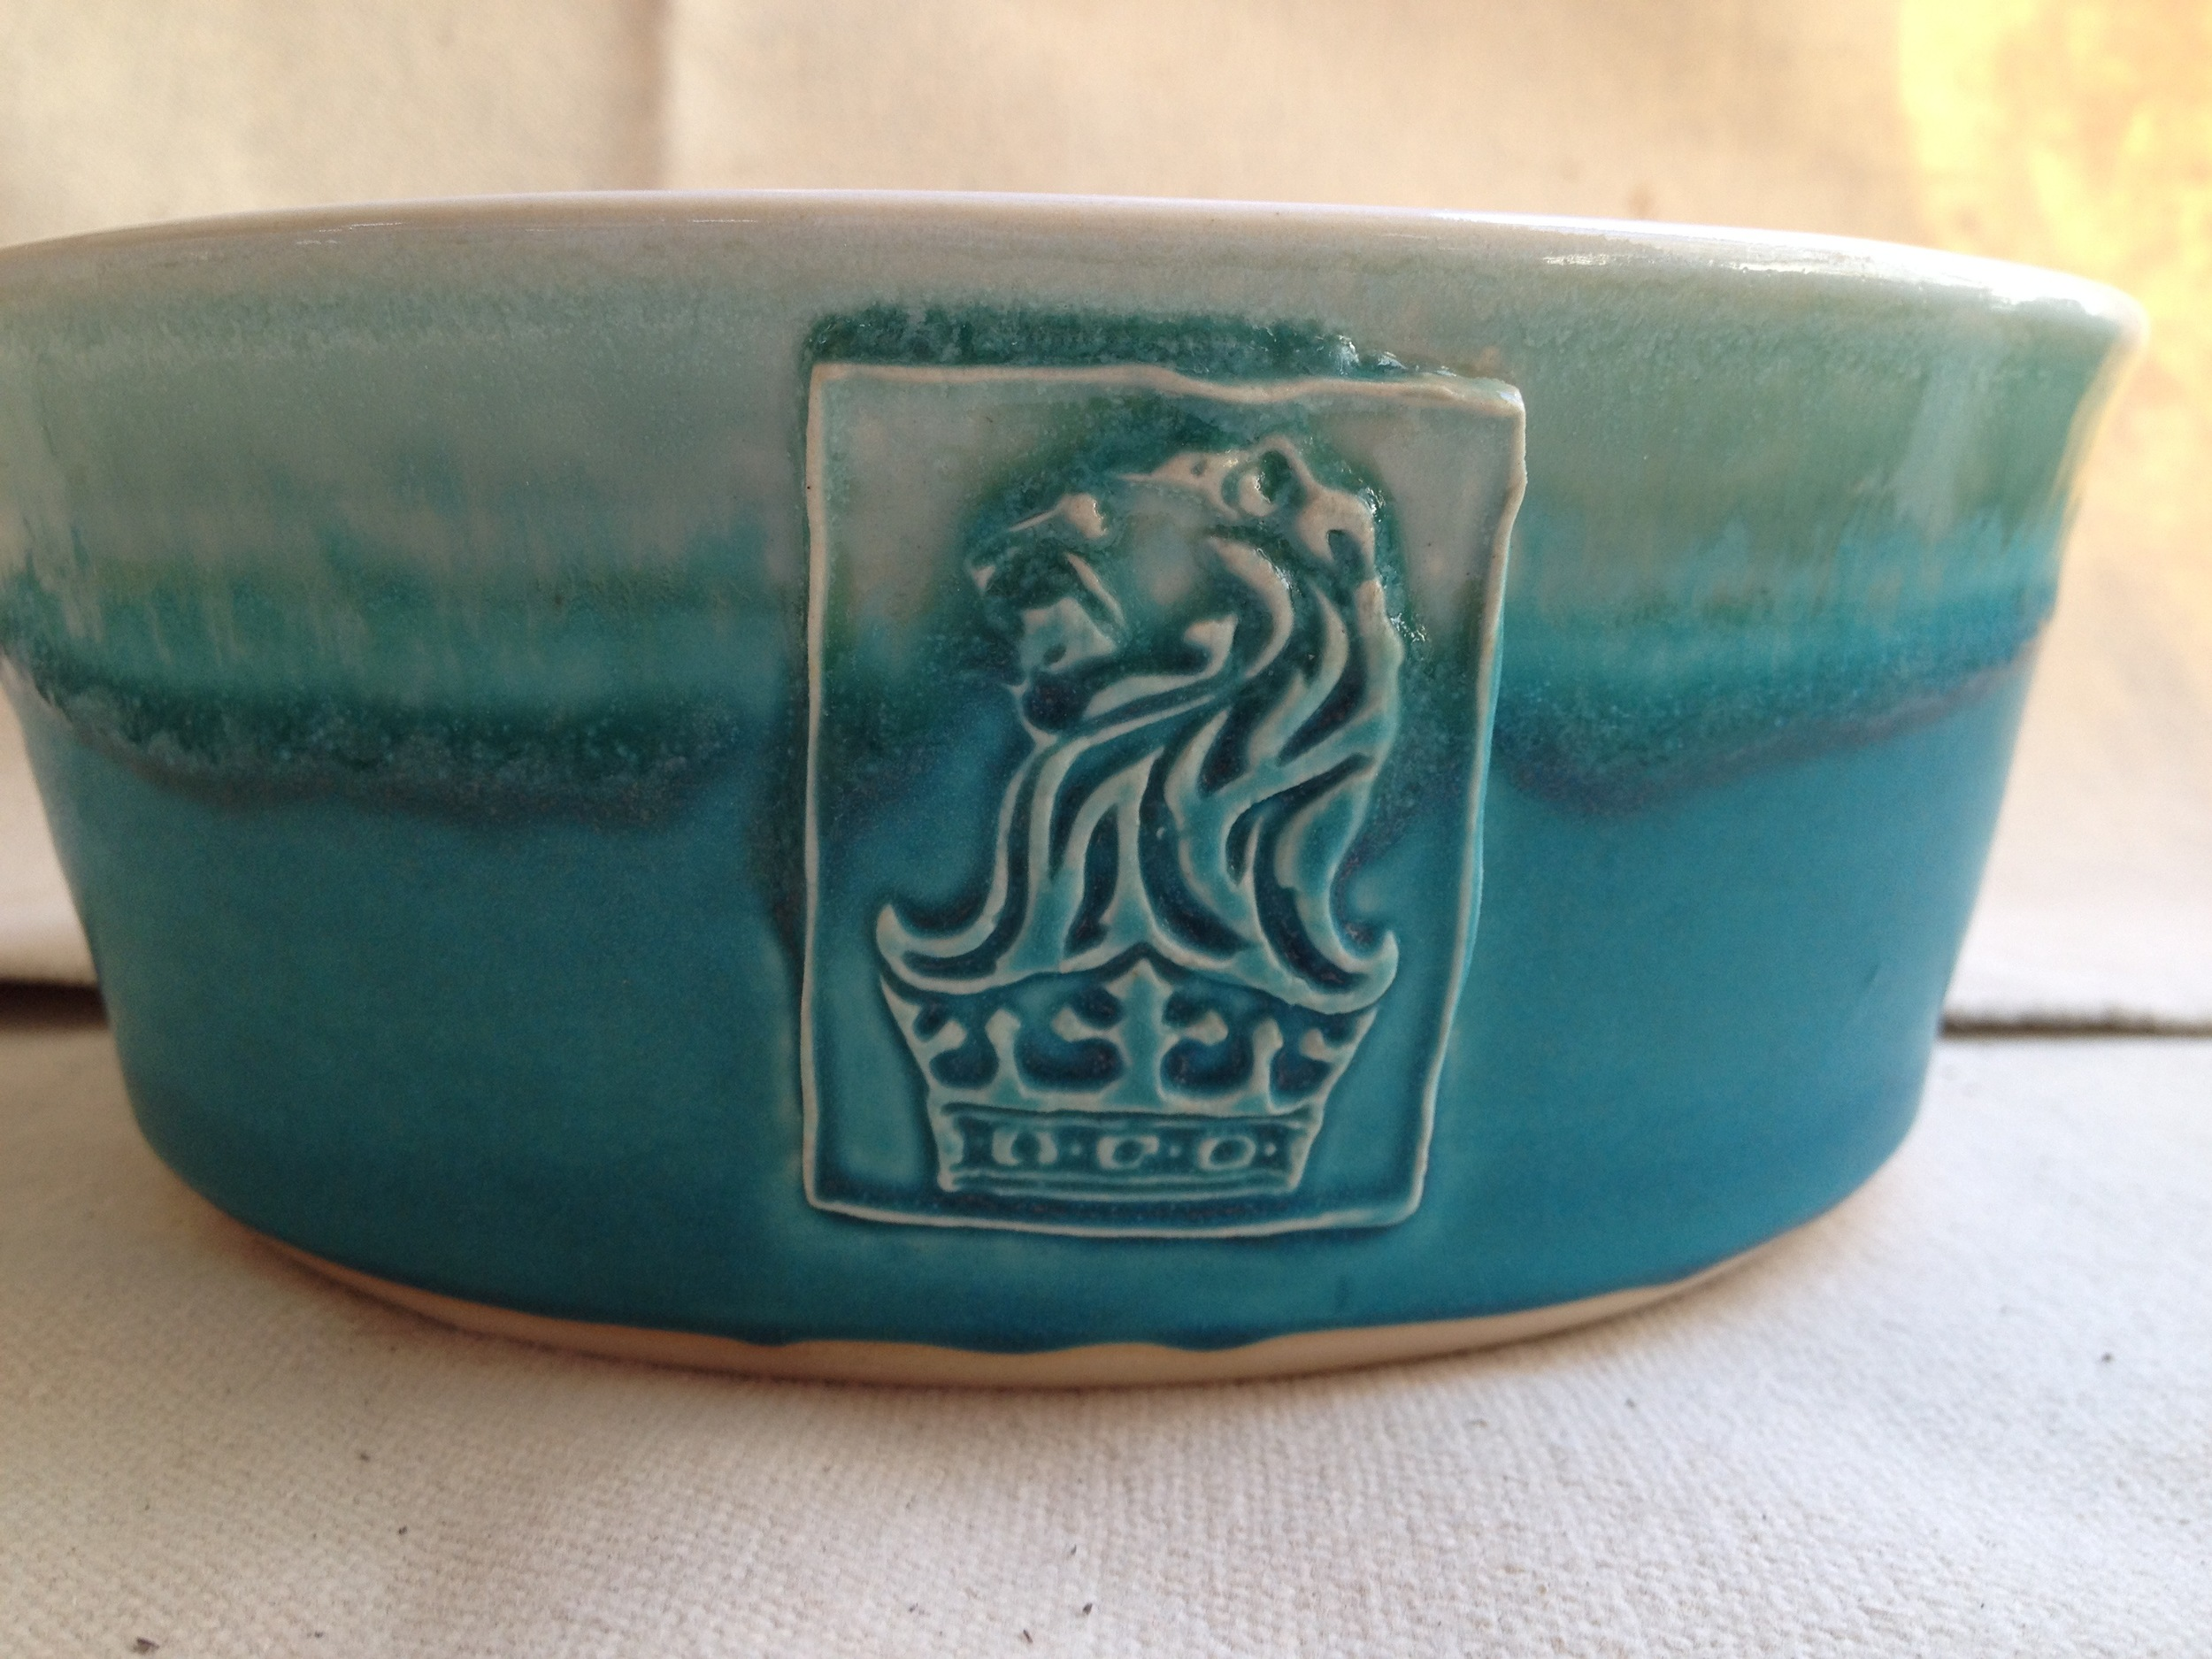 Ritz Carlton dog bowls